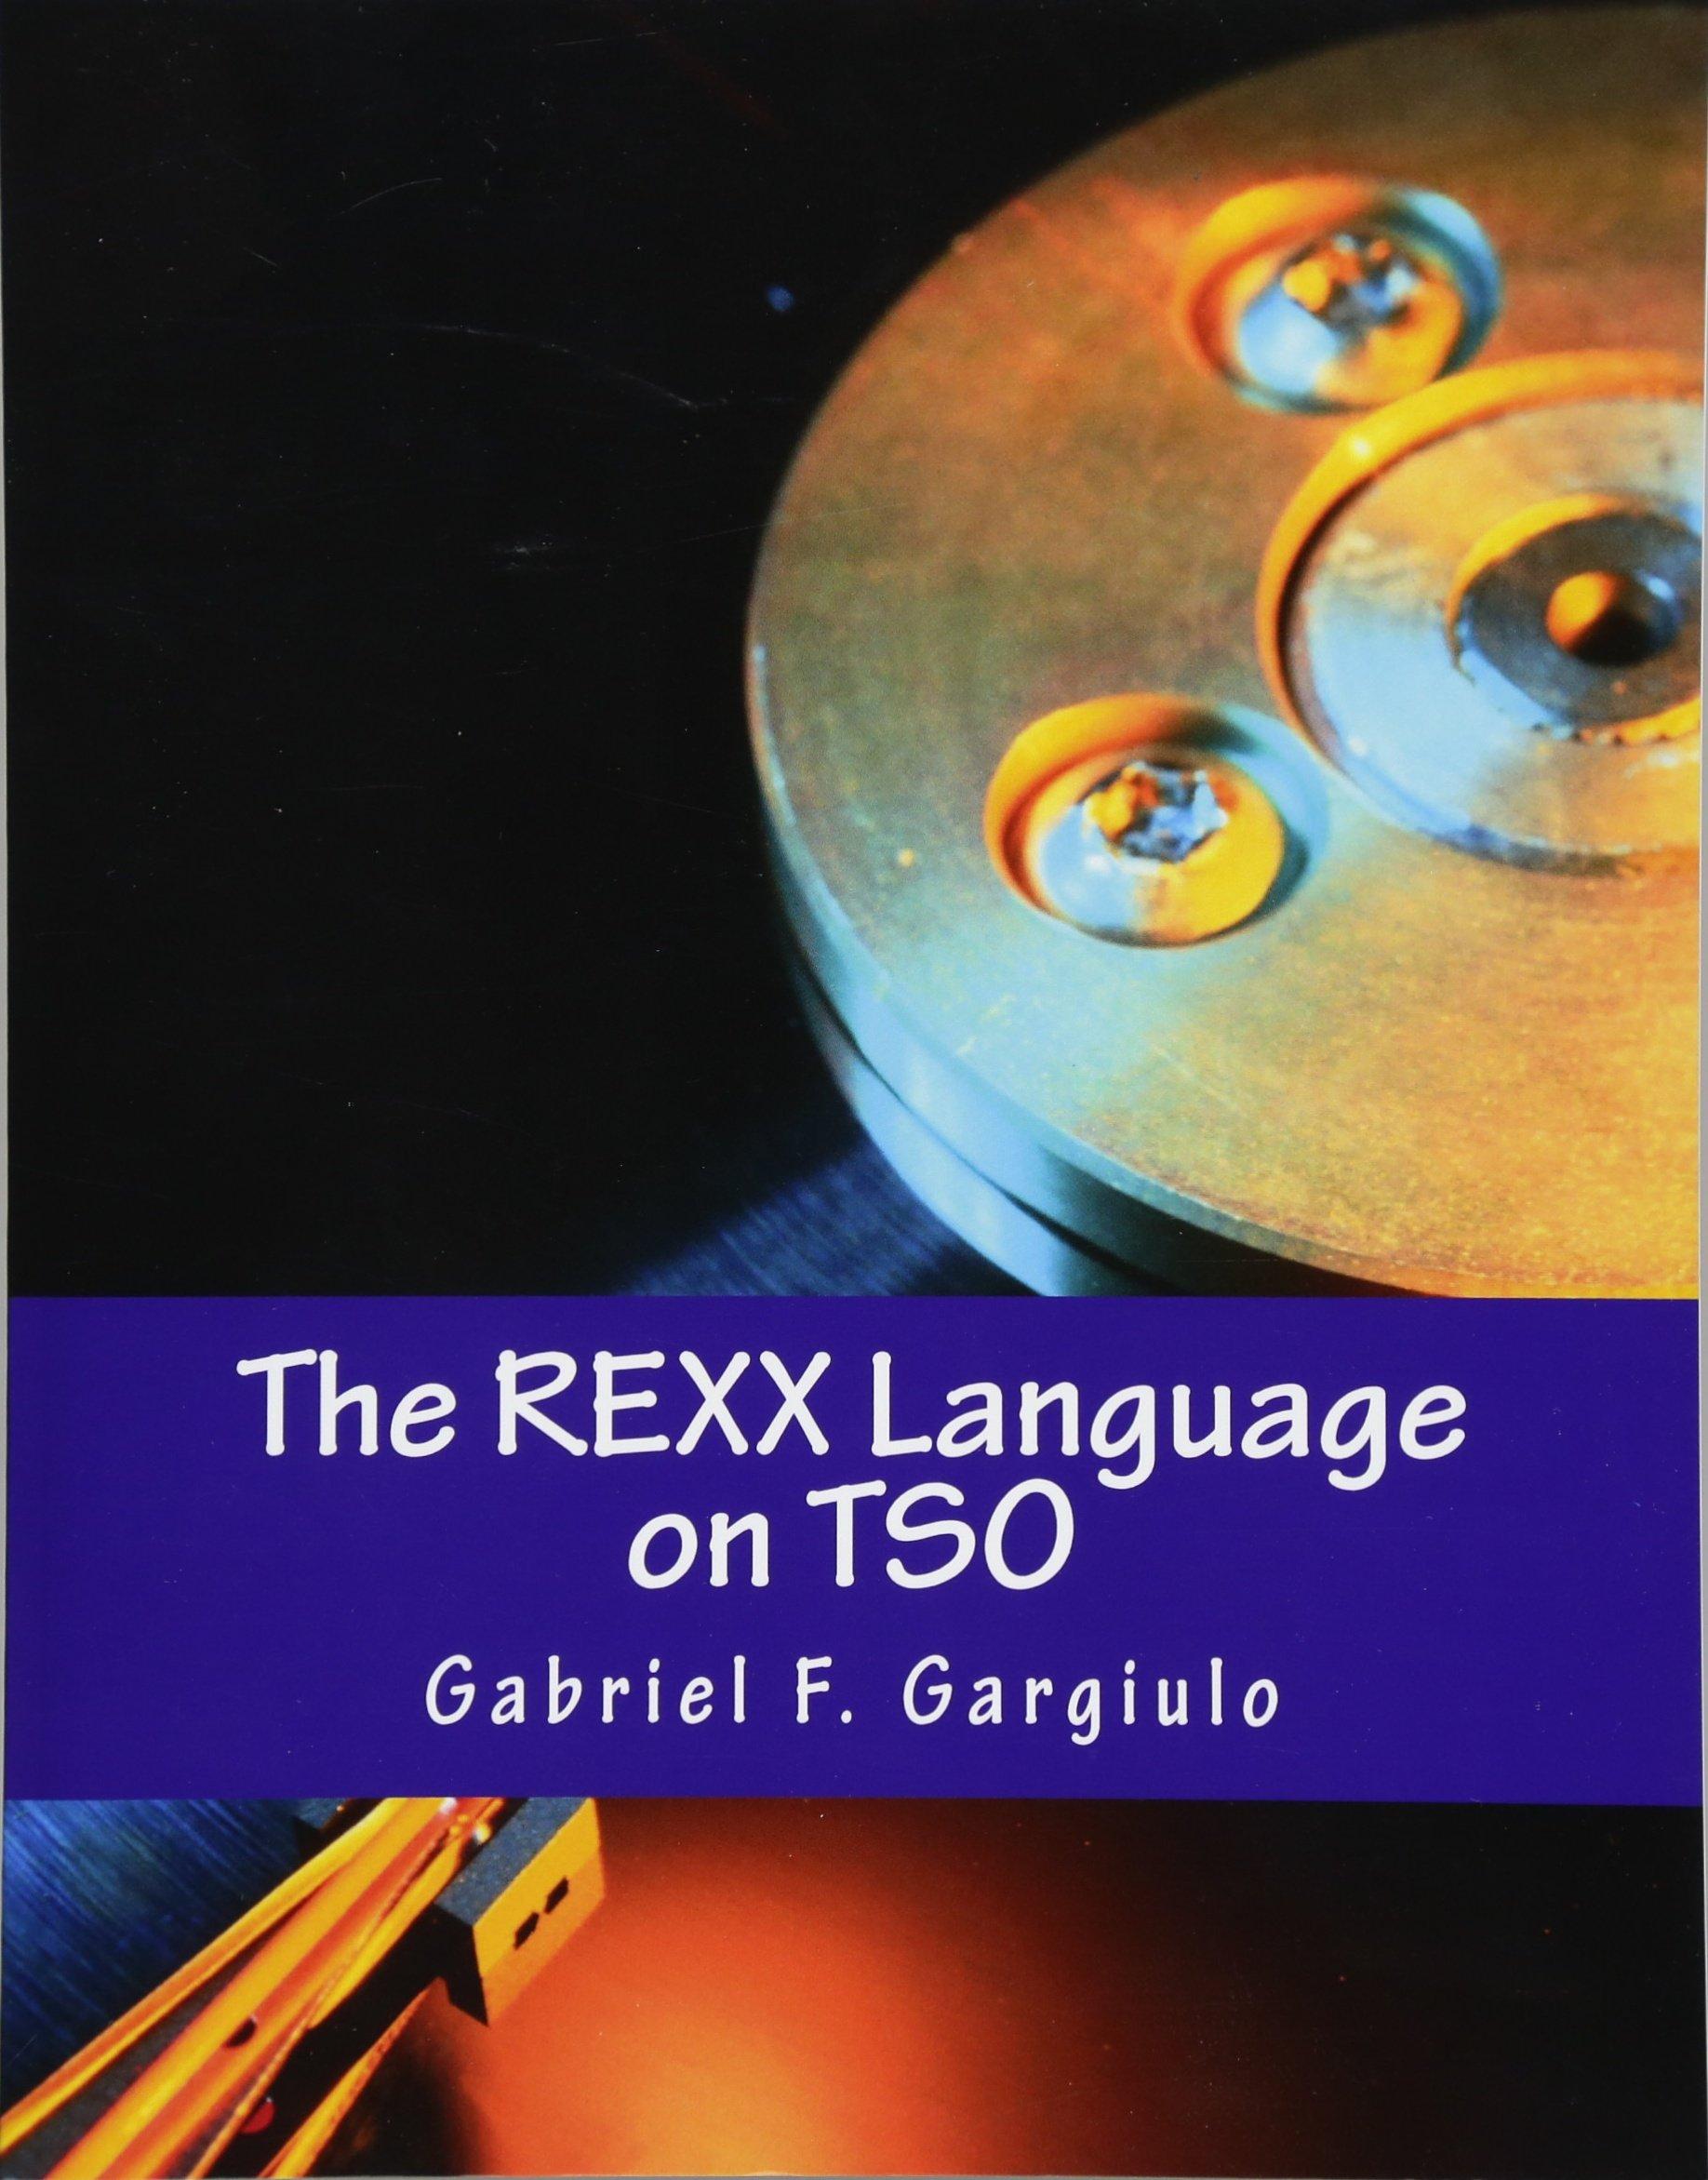 The REXX Language on TSO: Gabriel F  Gargiulo: 9781479104772